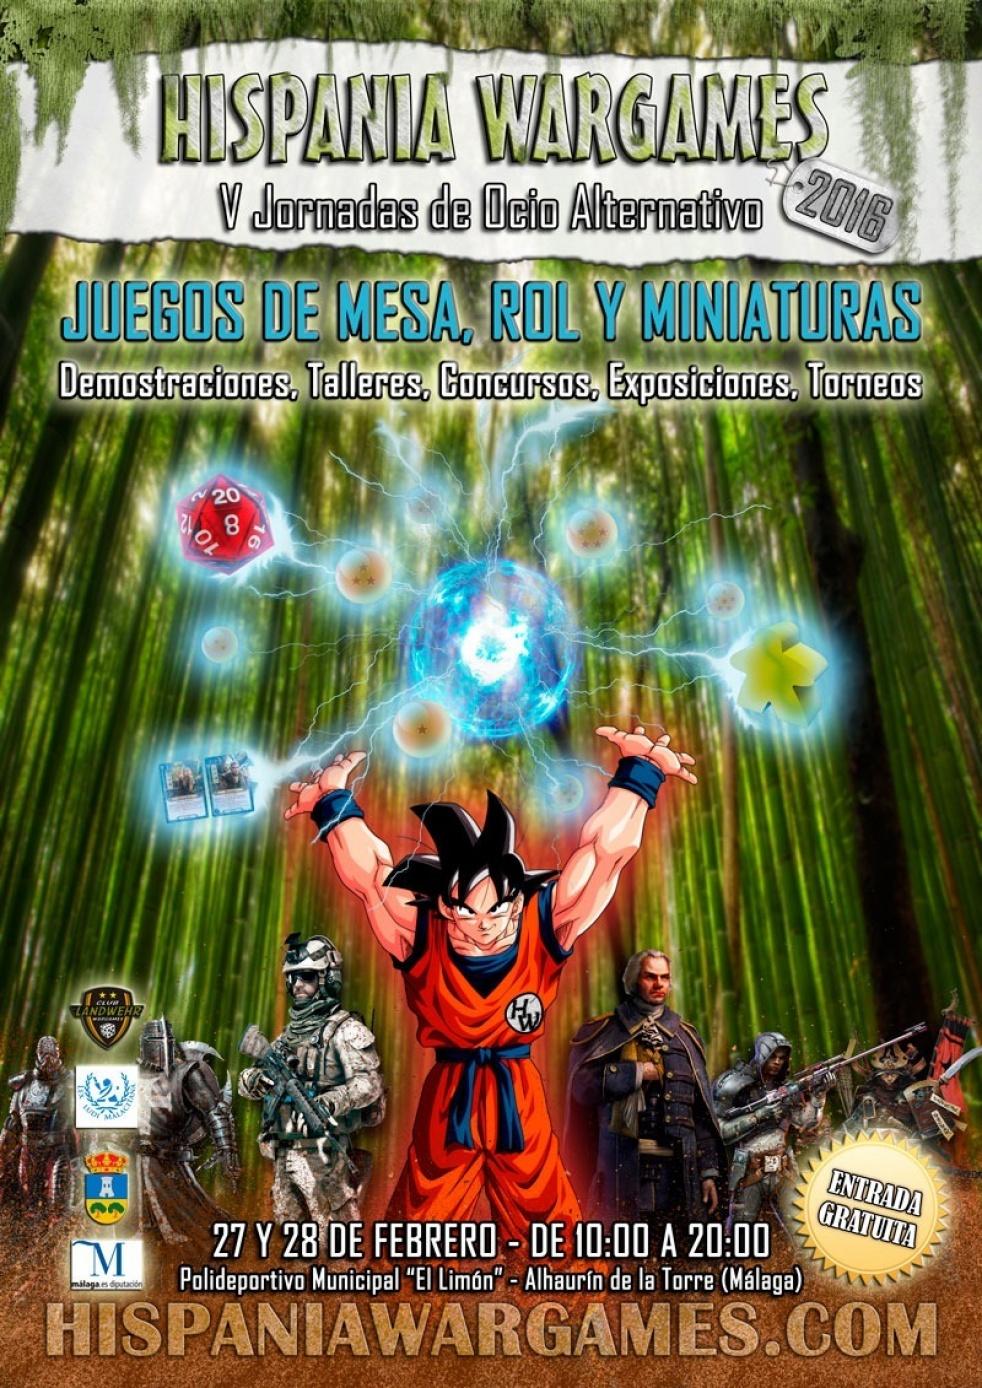 Hispana Wargames 2016 - show cover